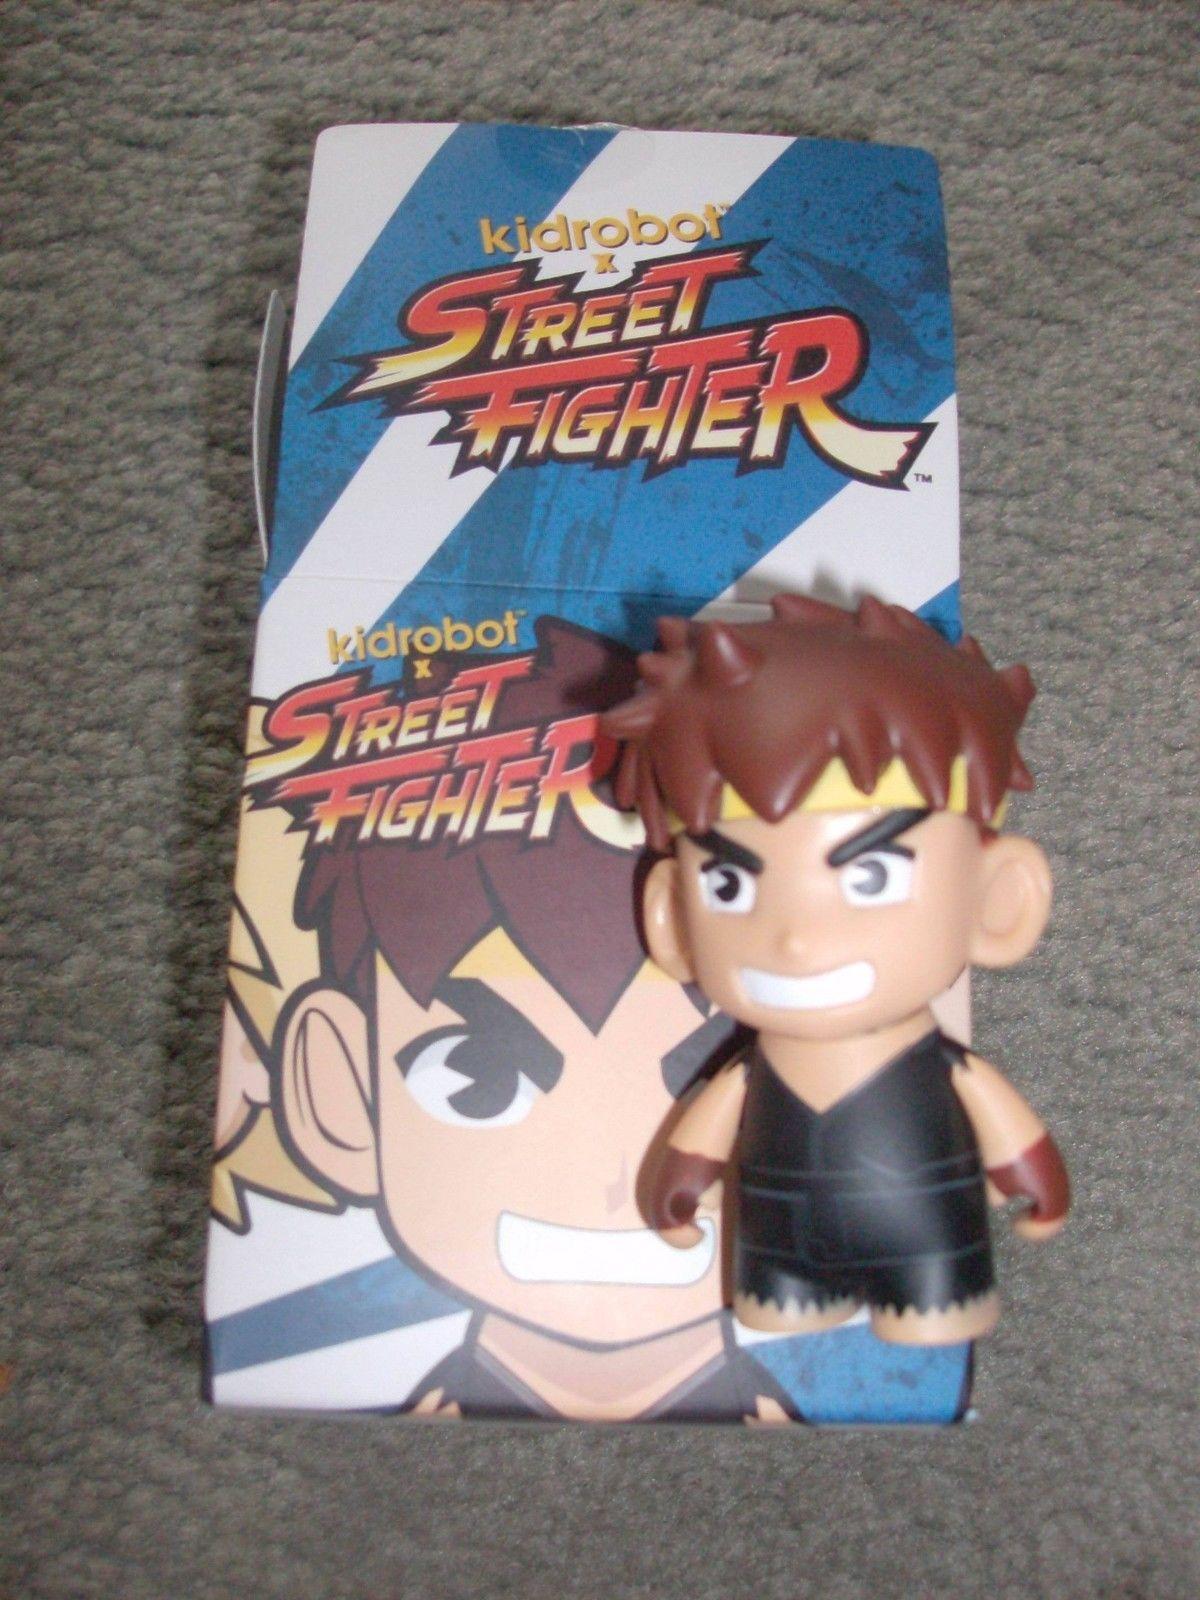 Street Fighter Ryu by Kidrobot